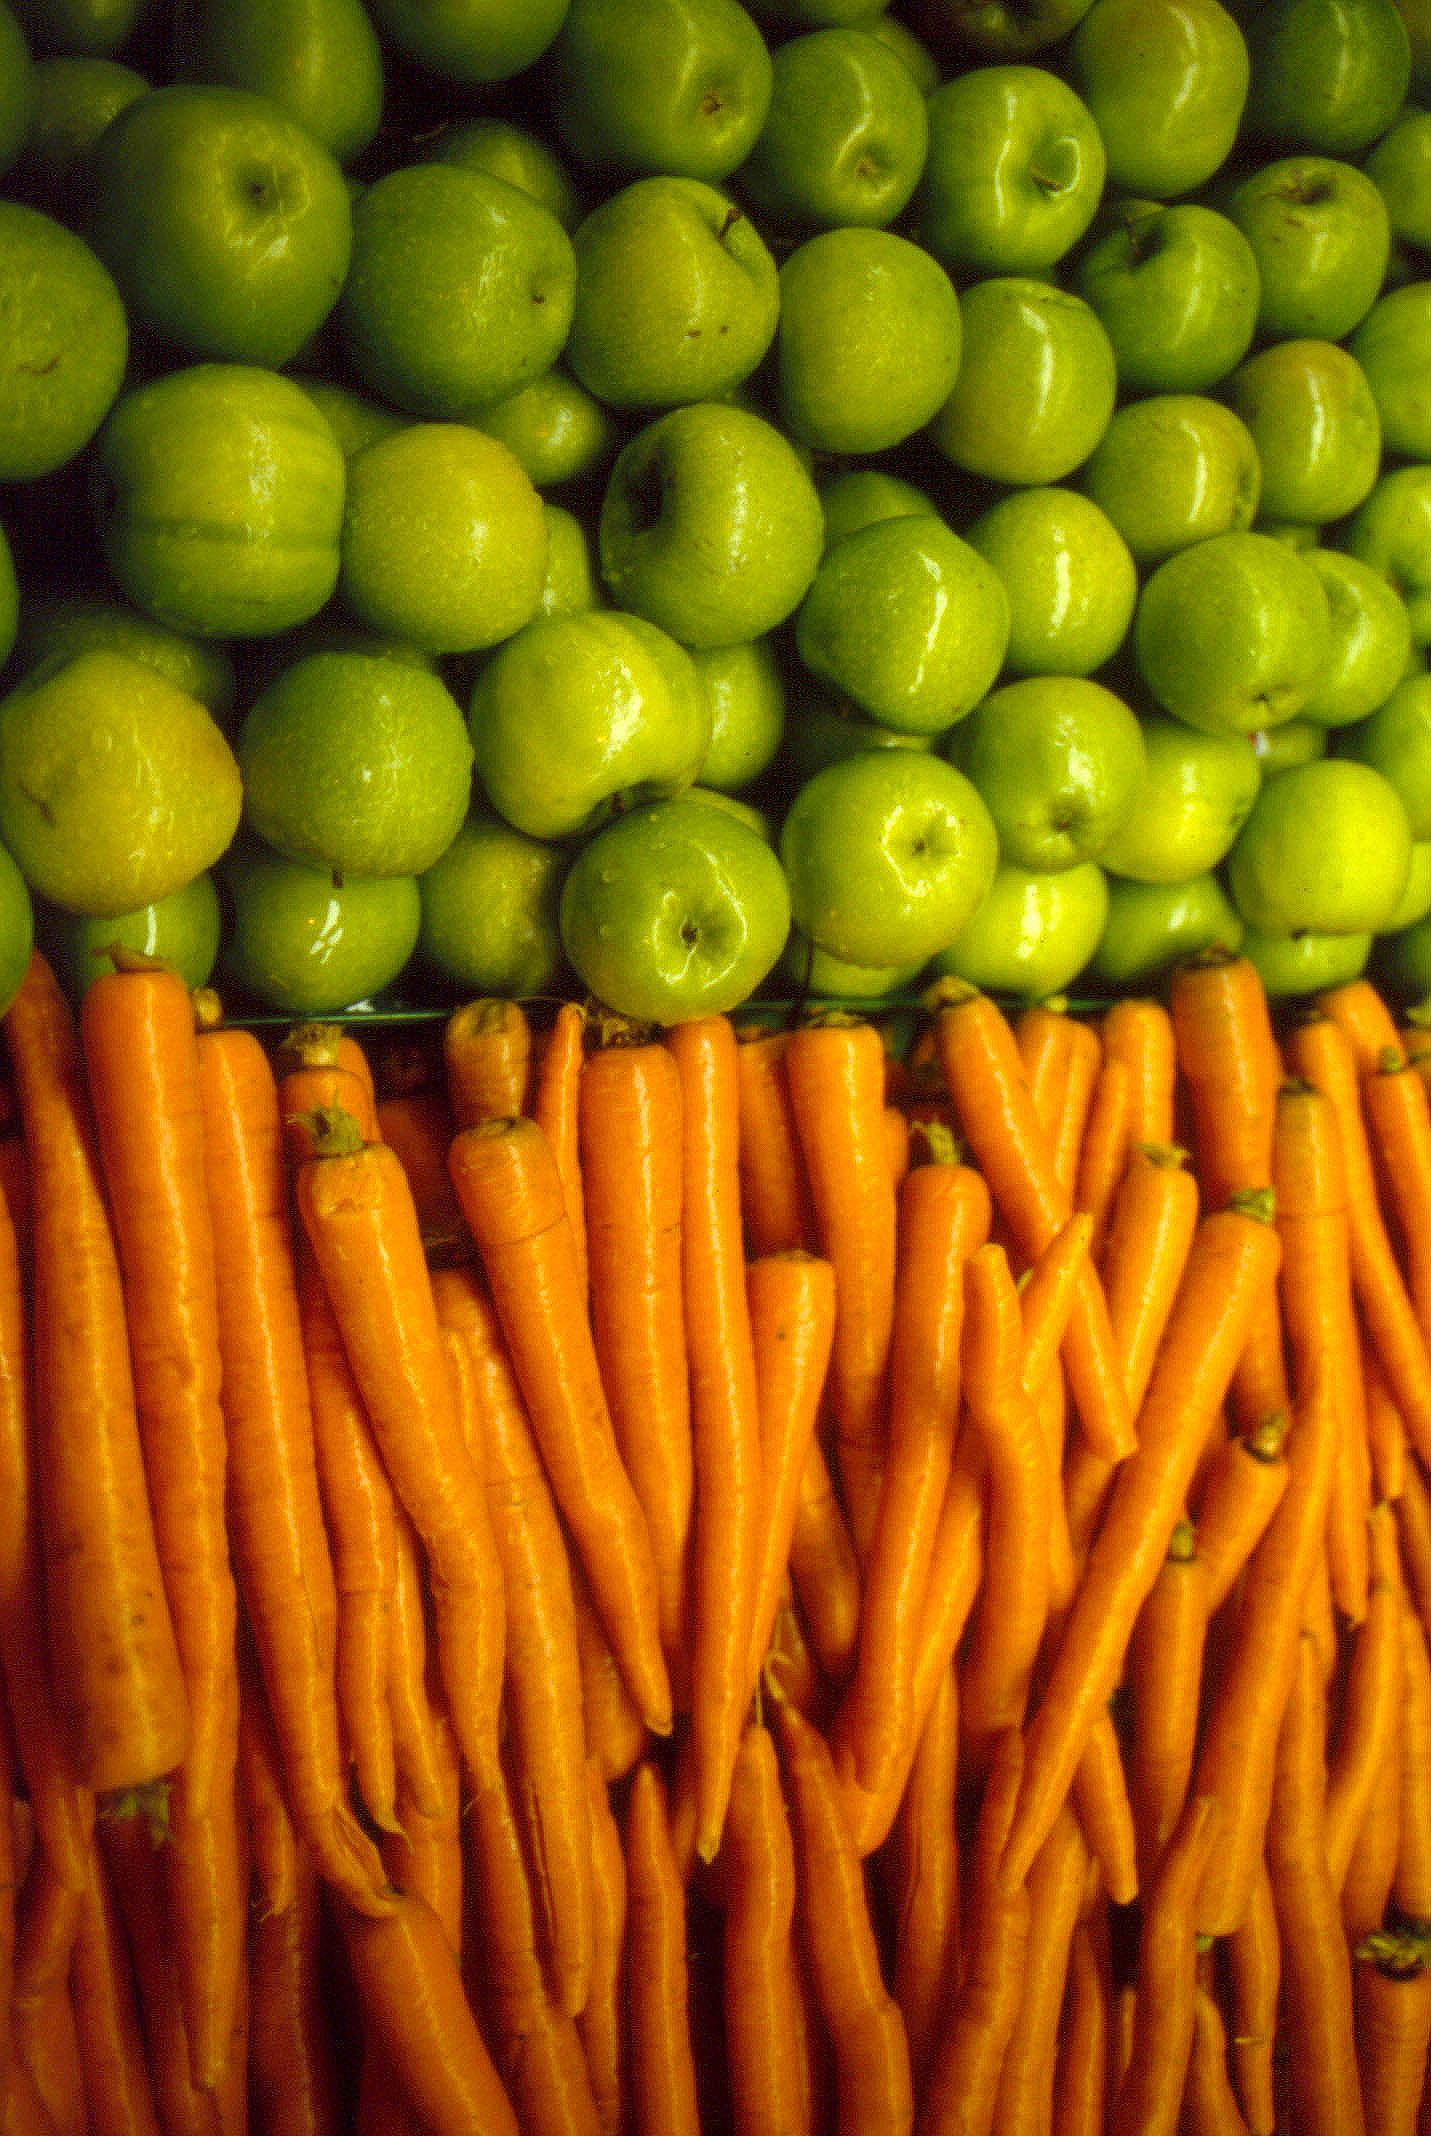 ss-oth-carrotsapples.jpg